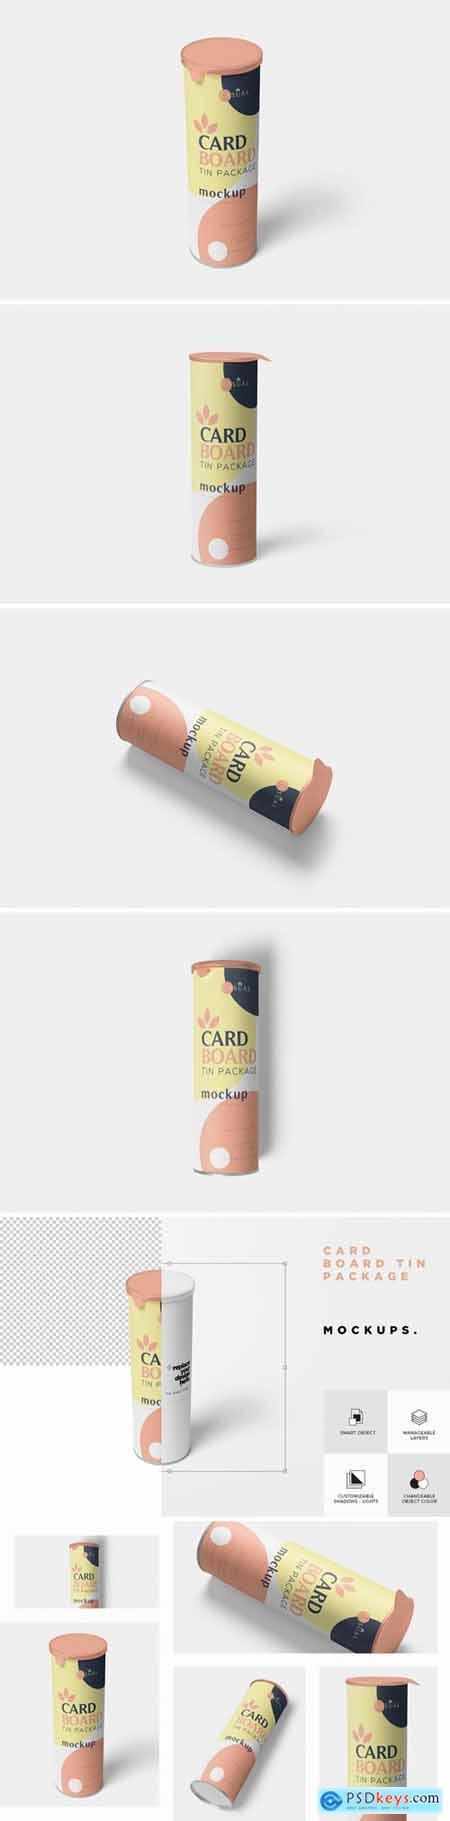 Cardboard Tube Mockups